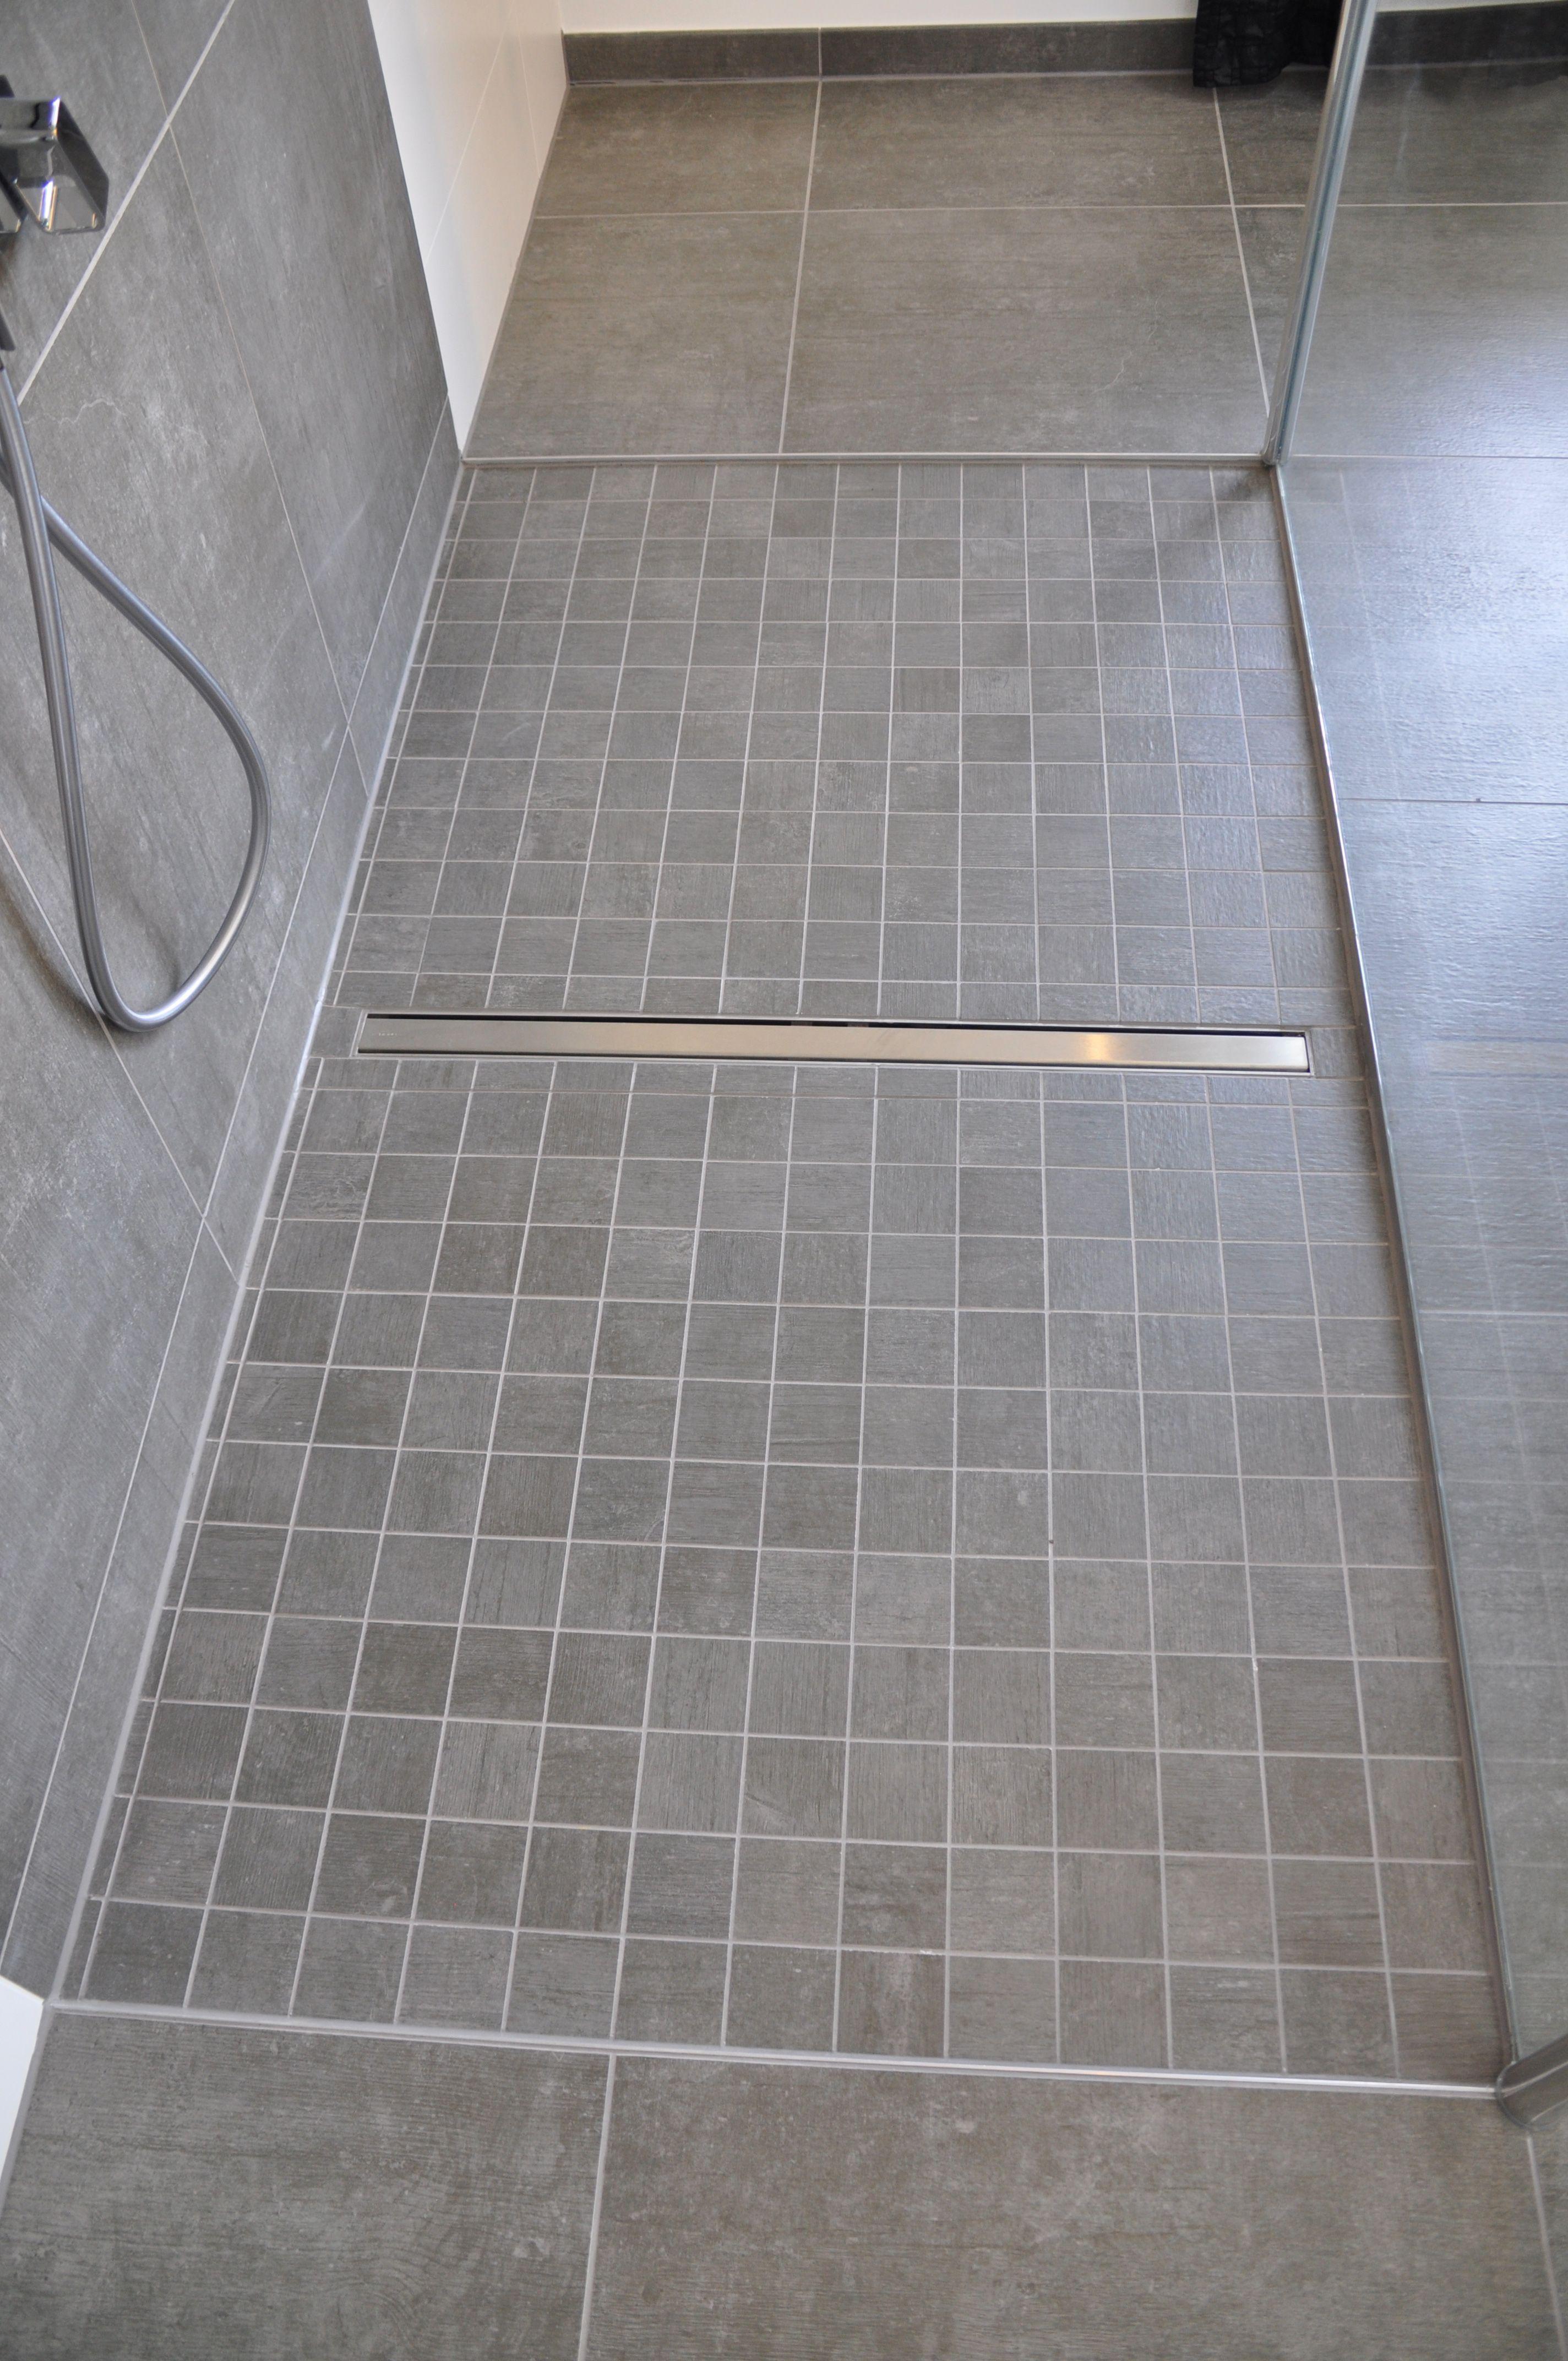 Bodenebene Dusche Mit Mosaik Villeroy & Boch Upper Side In